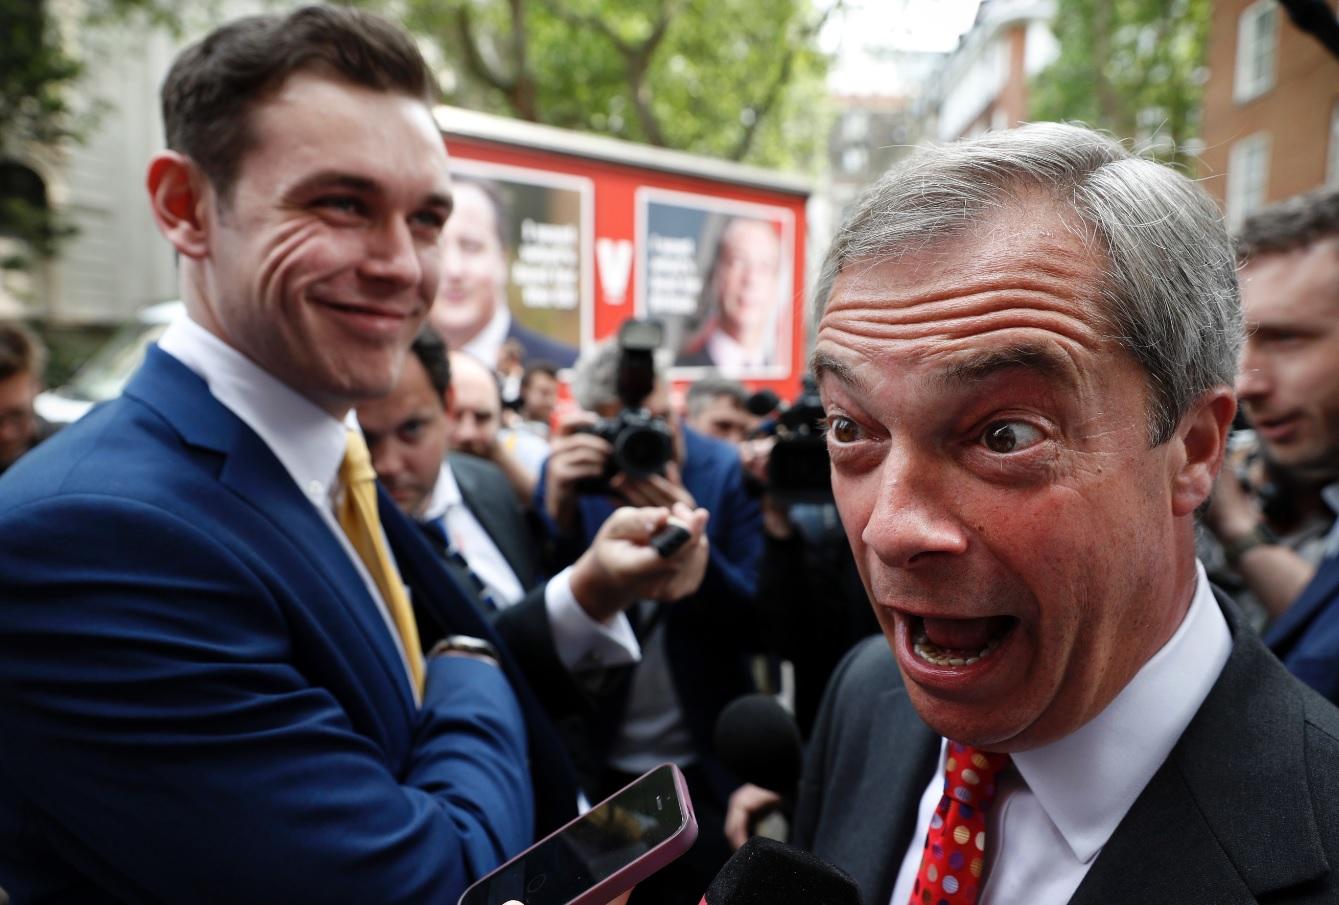 Michael Heaver and Nigel Farage